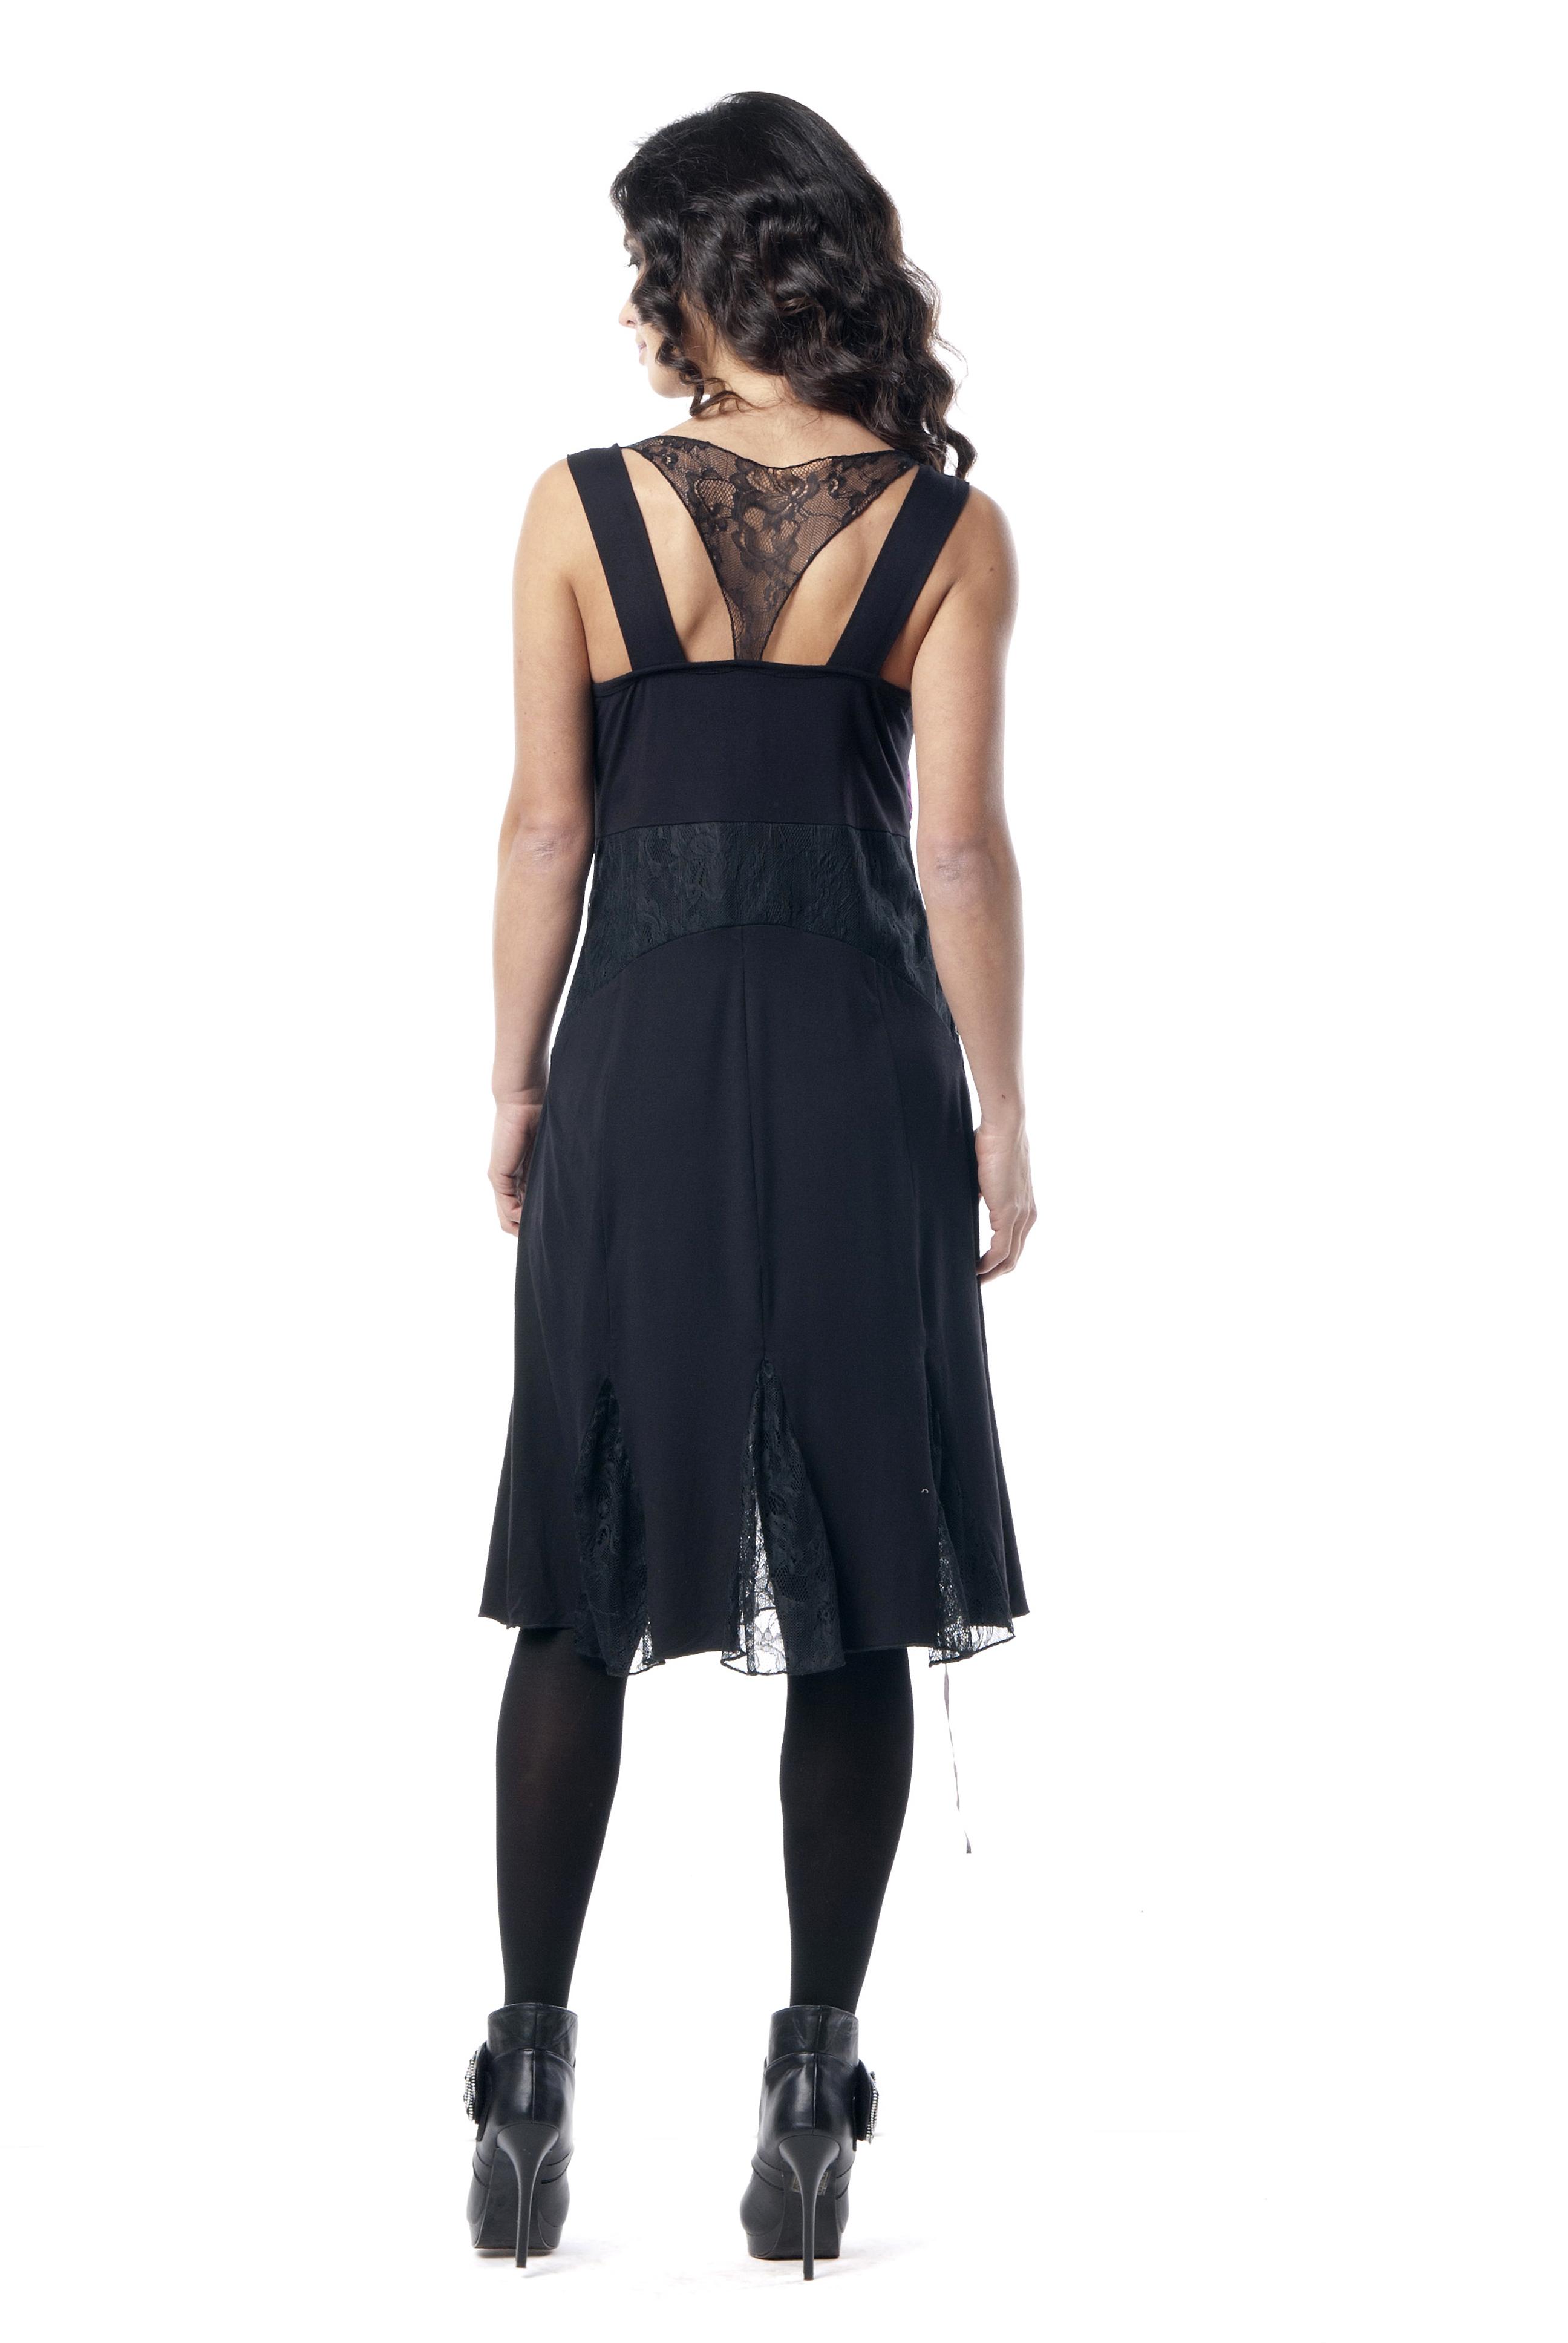 Les Fees Du Vent Couture: Sexy Sorcery Dress (1 Left!)